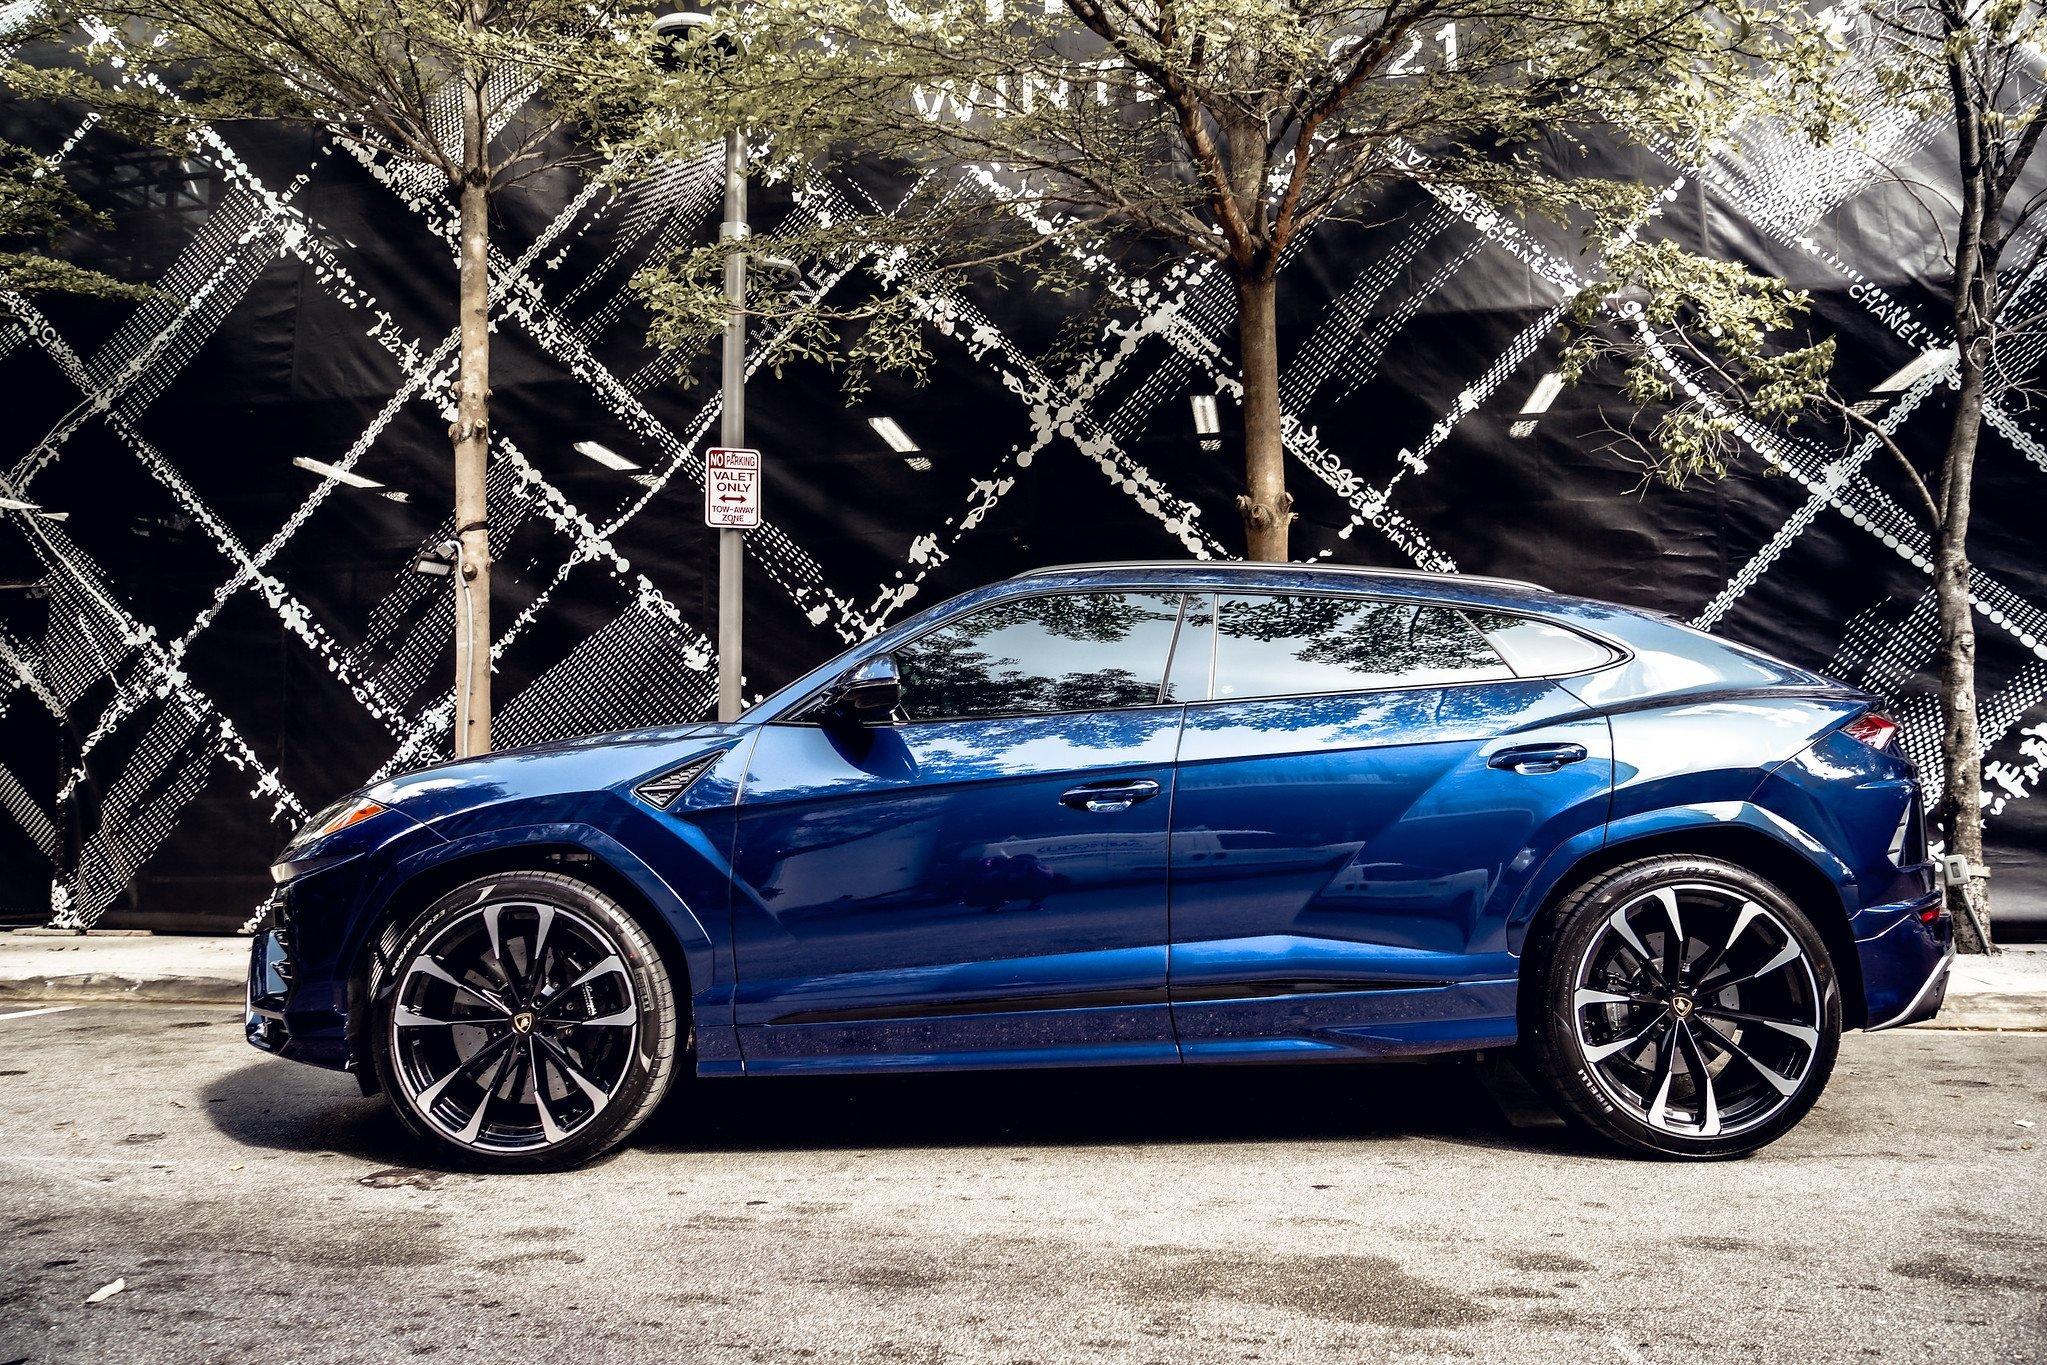 Image #10 of our  2021 Lamborghini Urus - Dark Blue    In Miami Fort Lauderdale Palm Beach South Florida